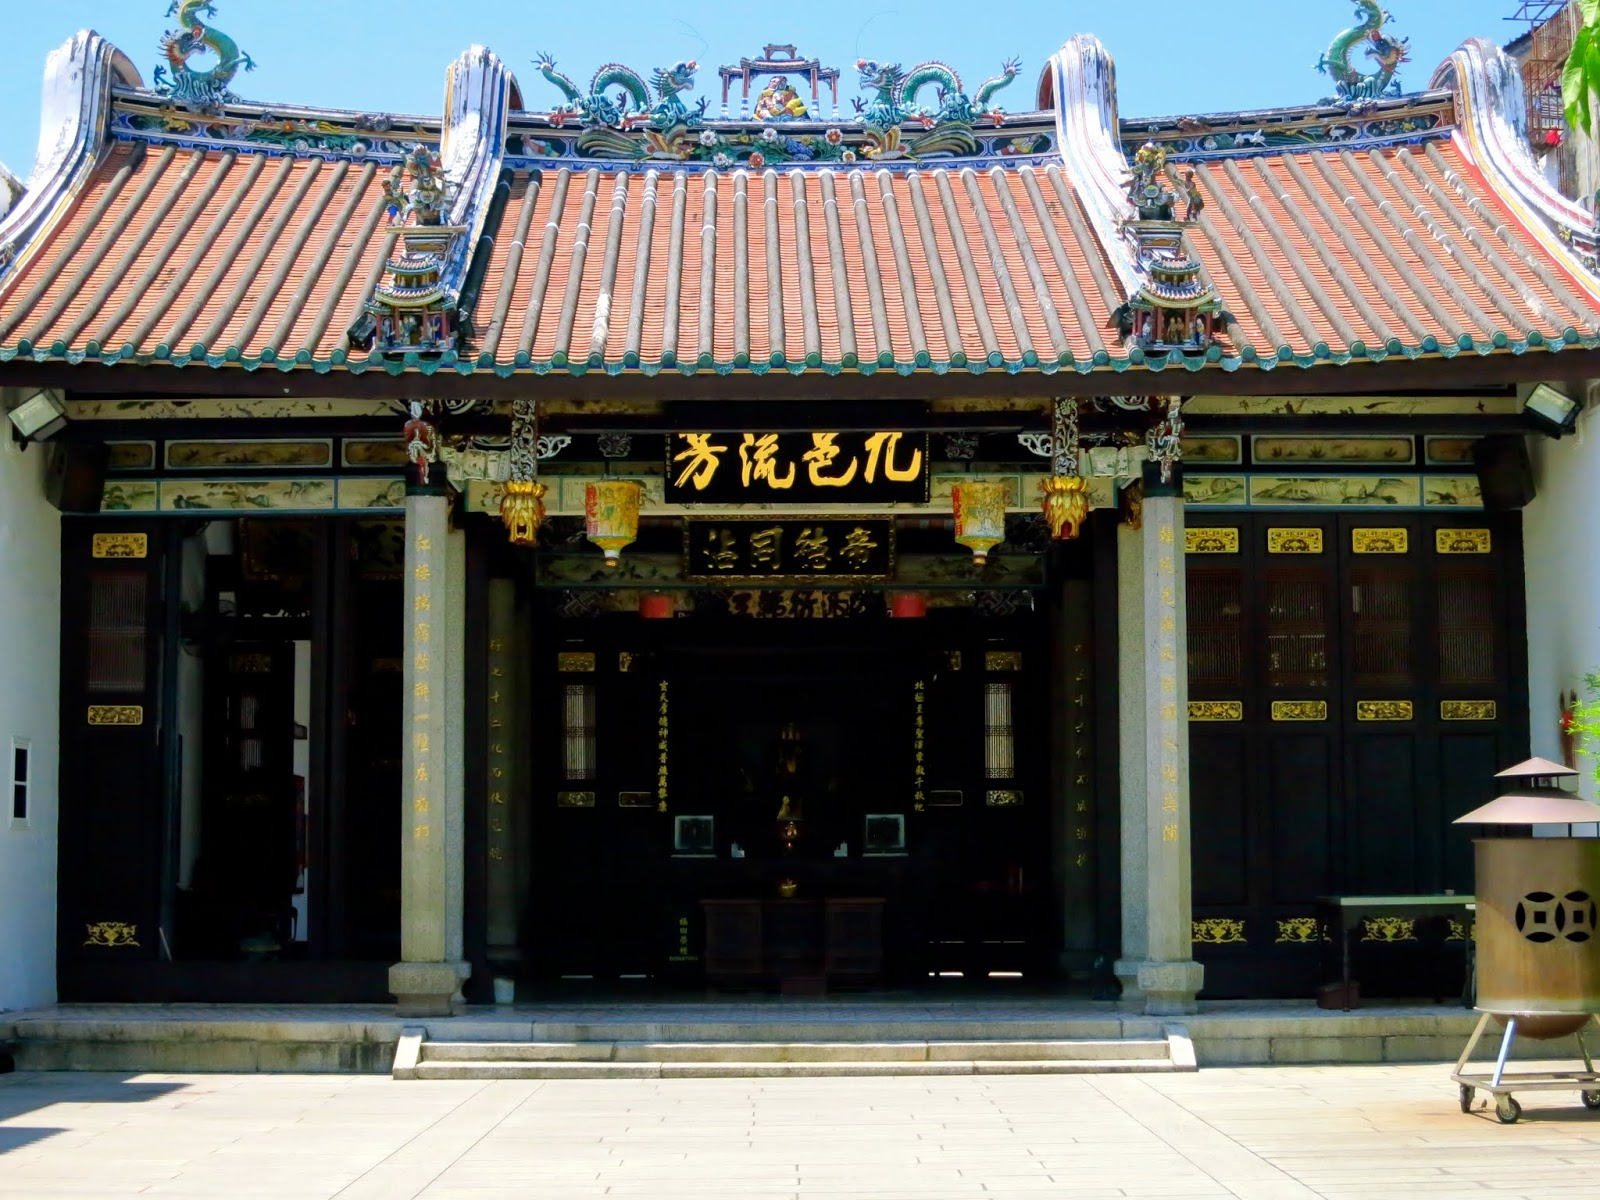 Temple in Georgetown, Penang, Malaysia